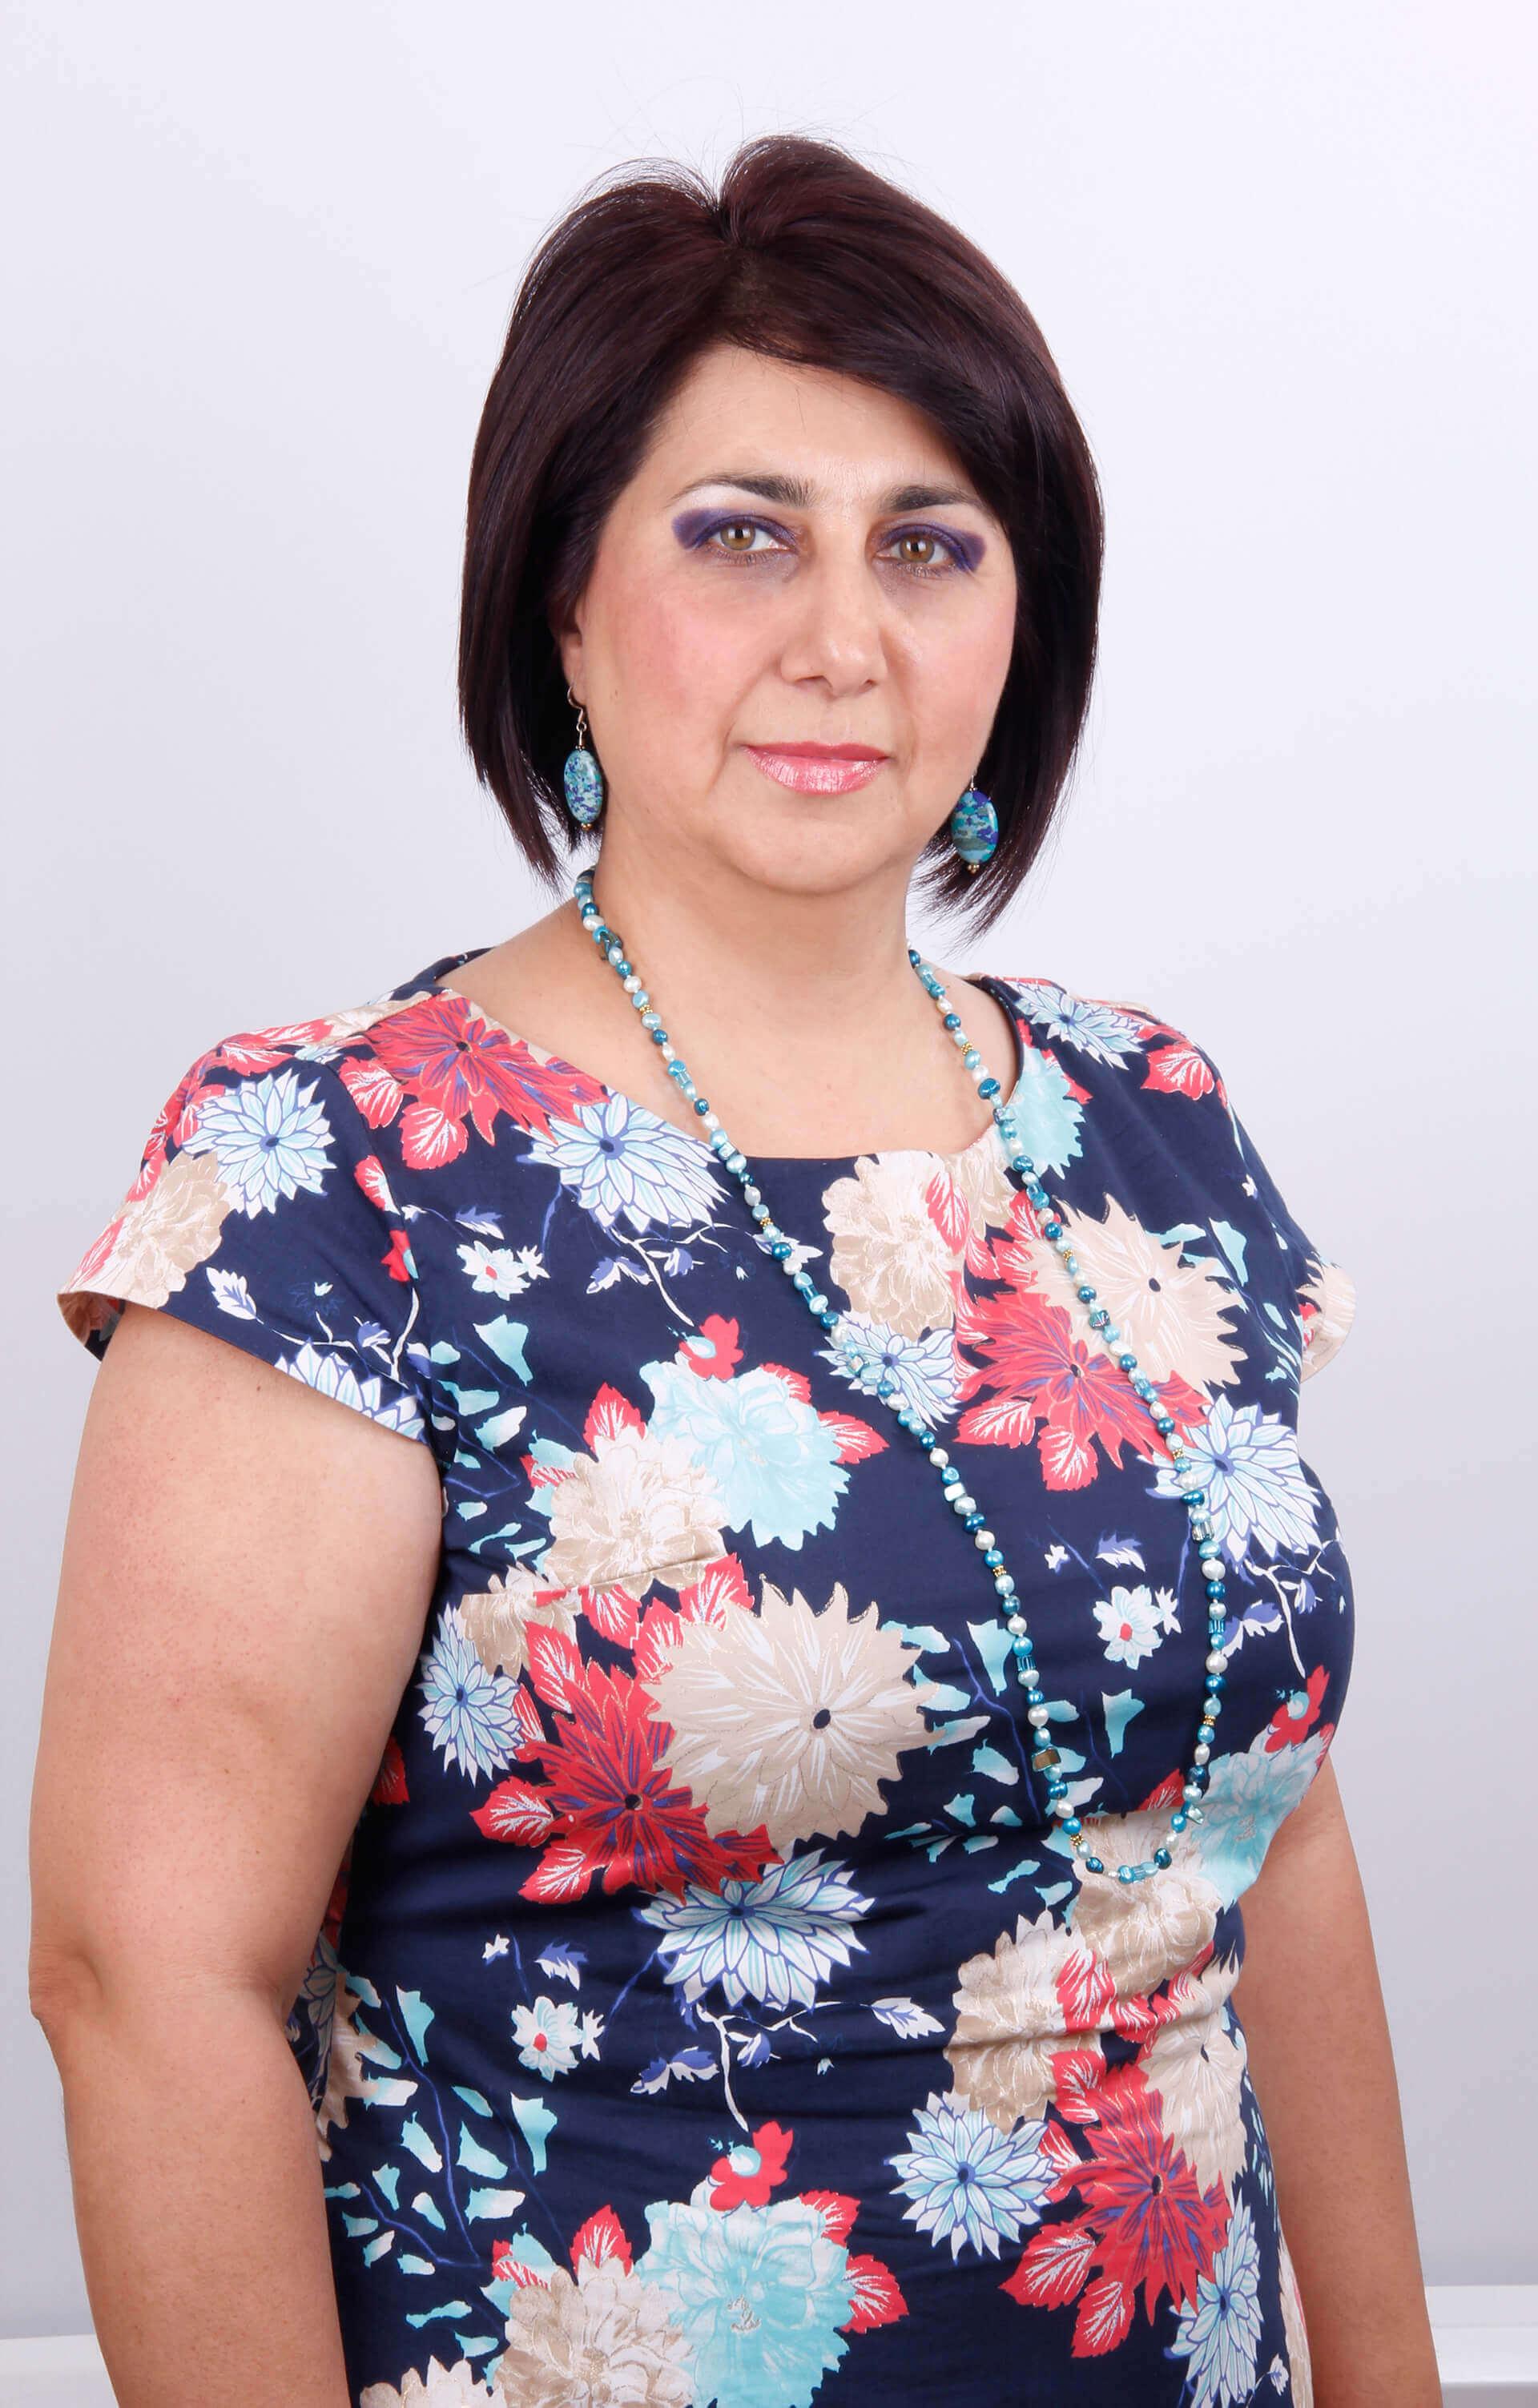 Marina Kpryan